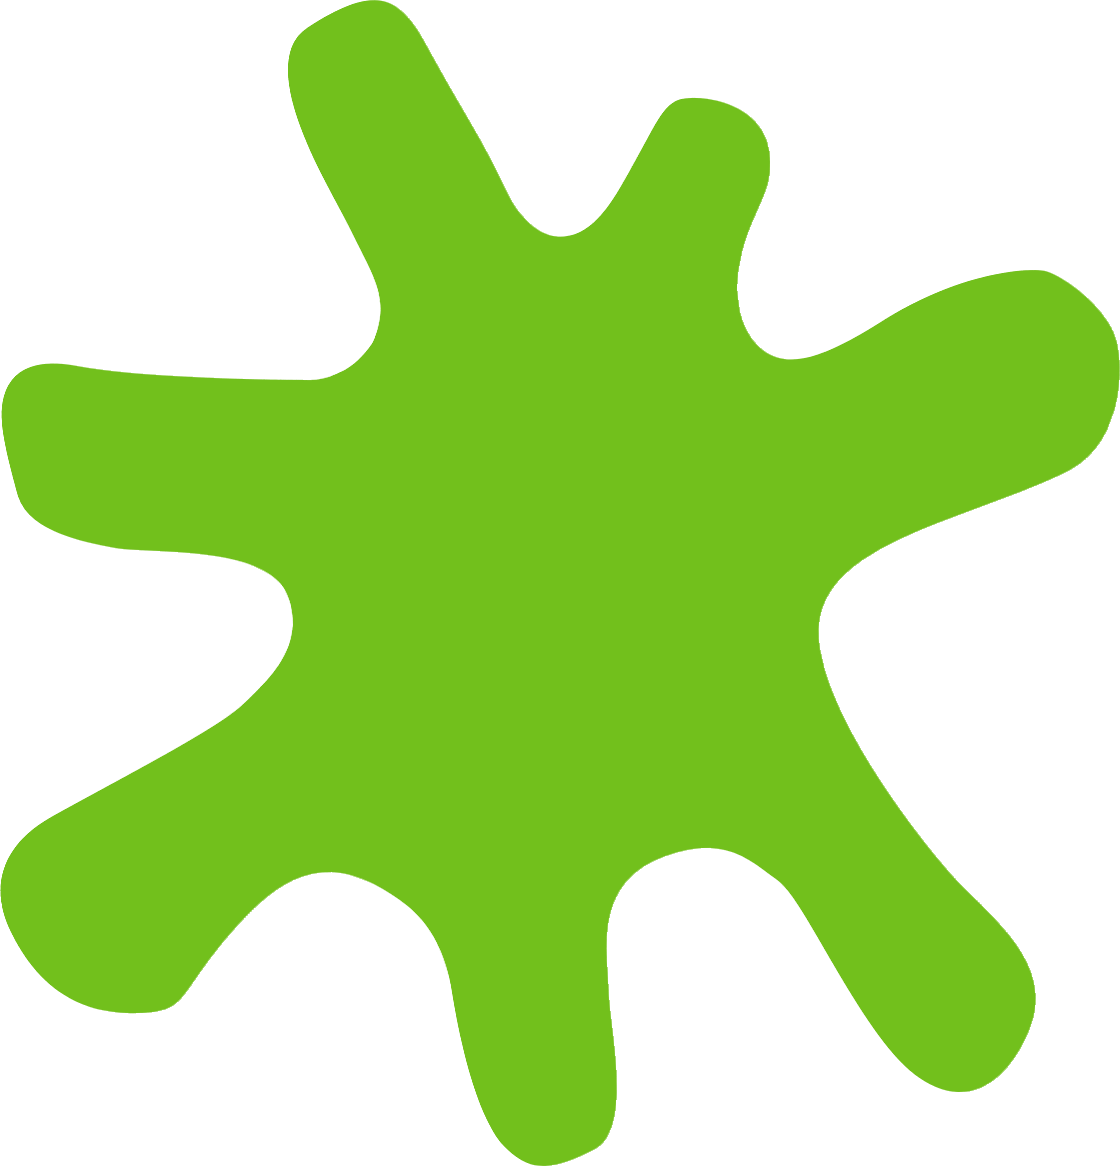 Green Splat